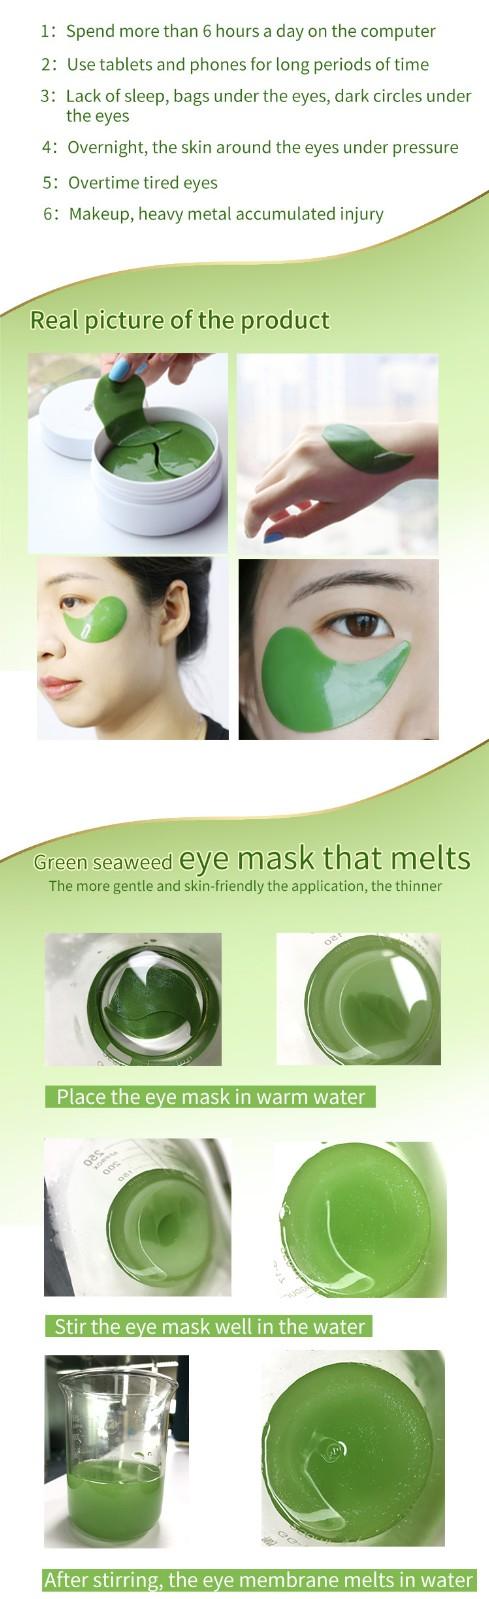 Calla-Oem Repair Eye Mask Manufacturer, Anti Aging Sleep Eye Mask | Calla-1